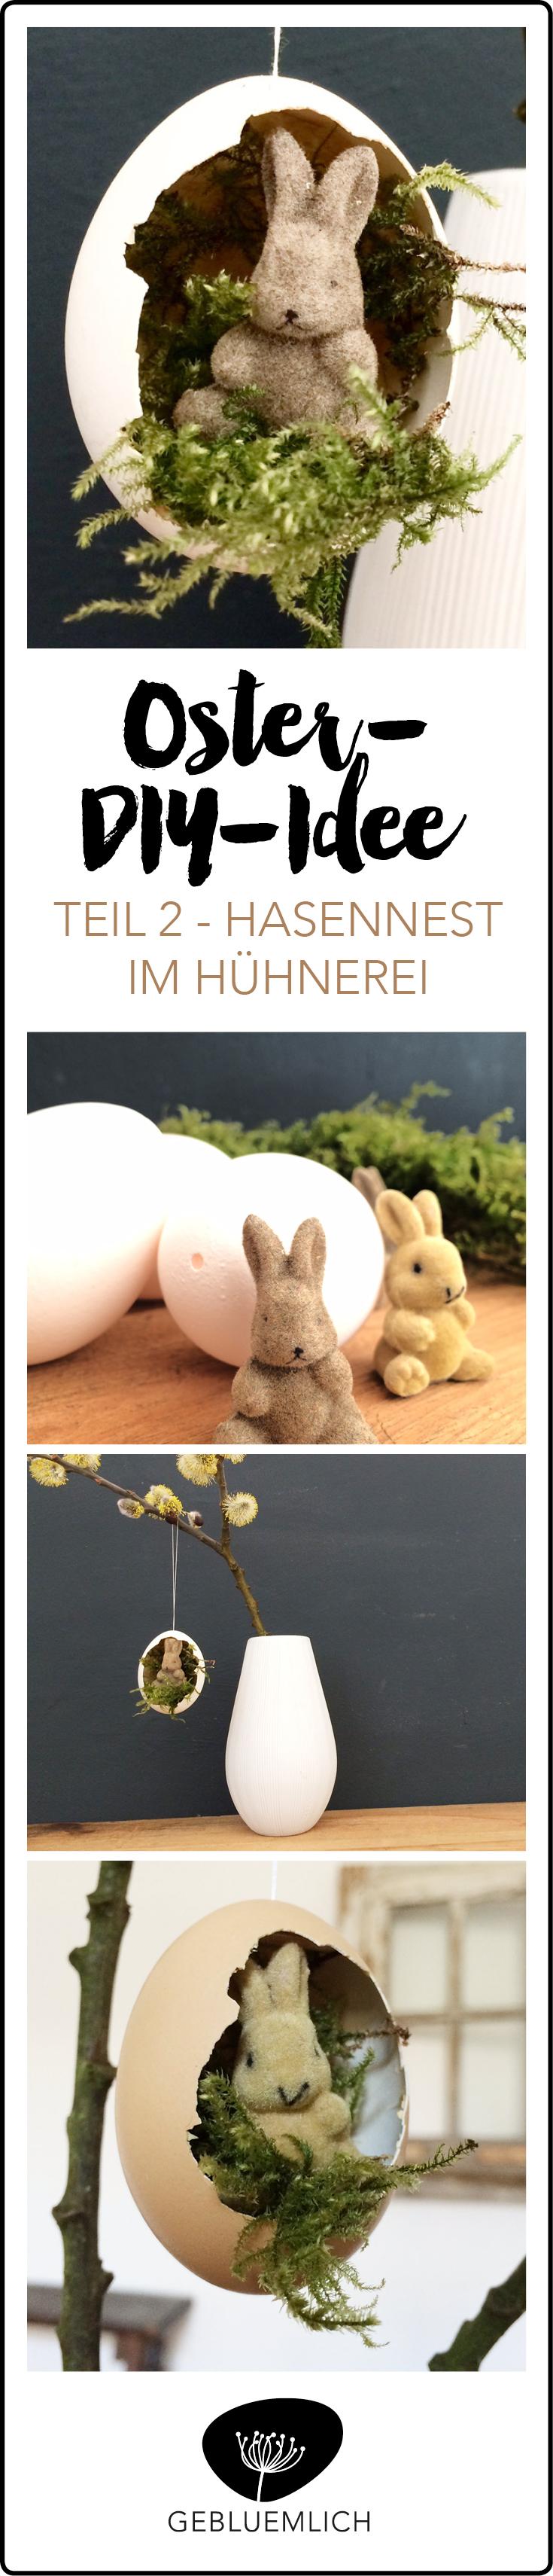 Oster-DIY-Idee Hasennest im Hühnerei